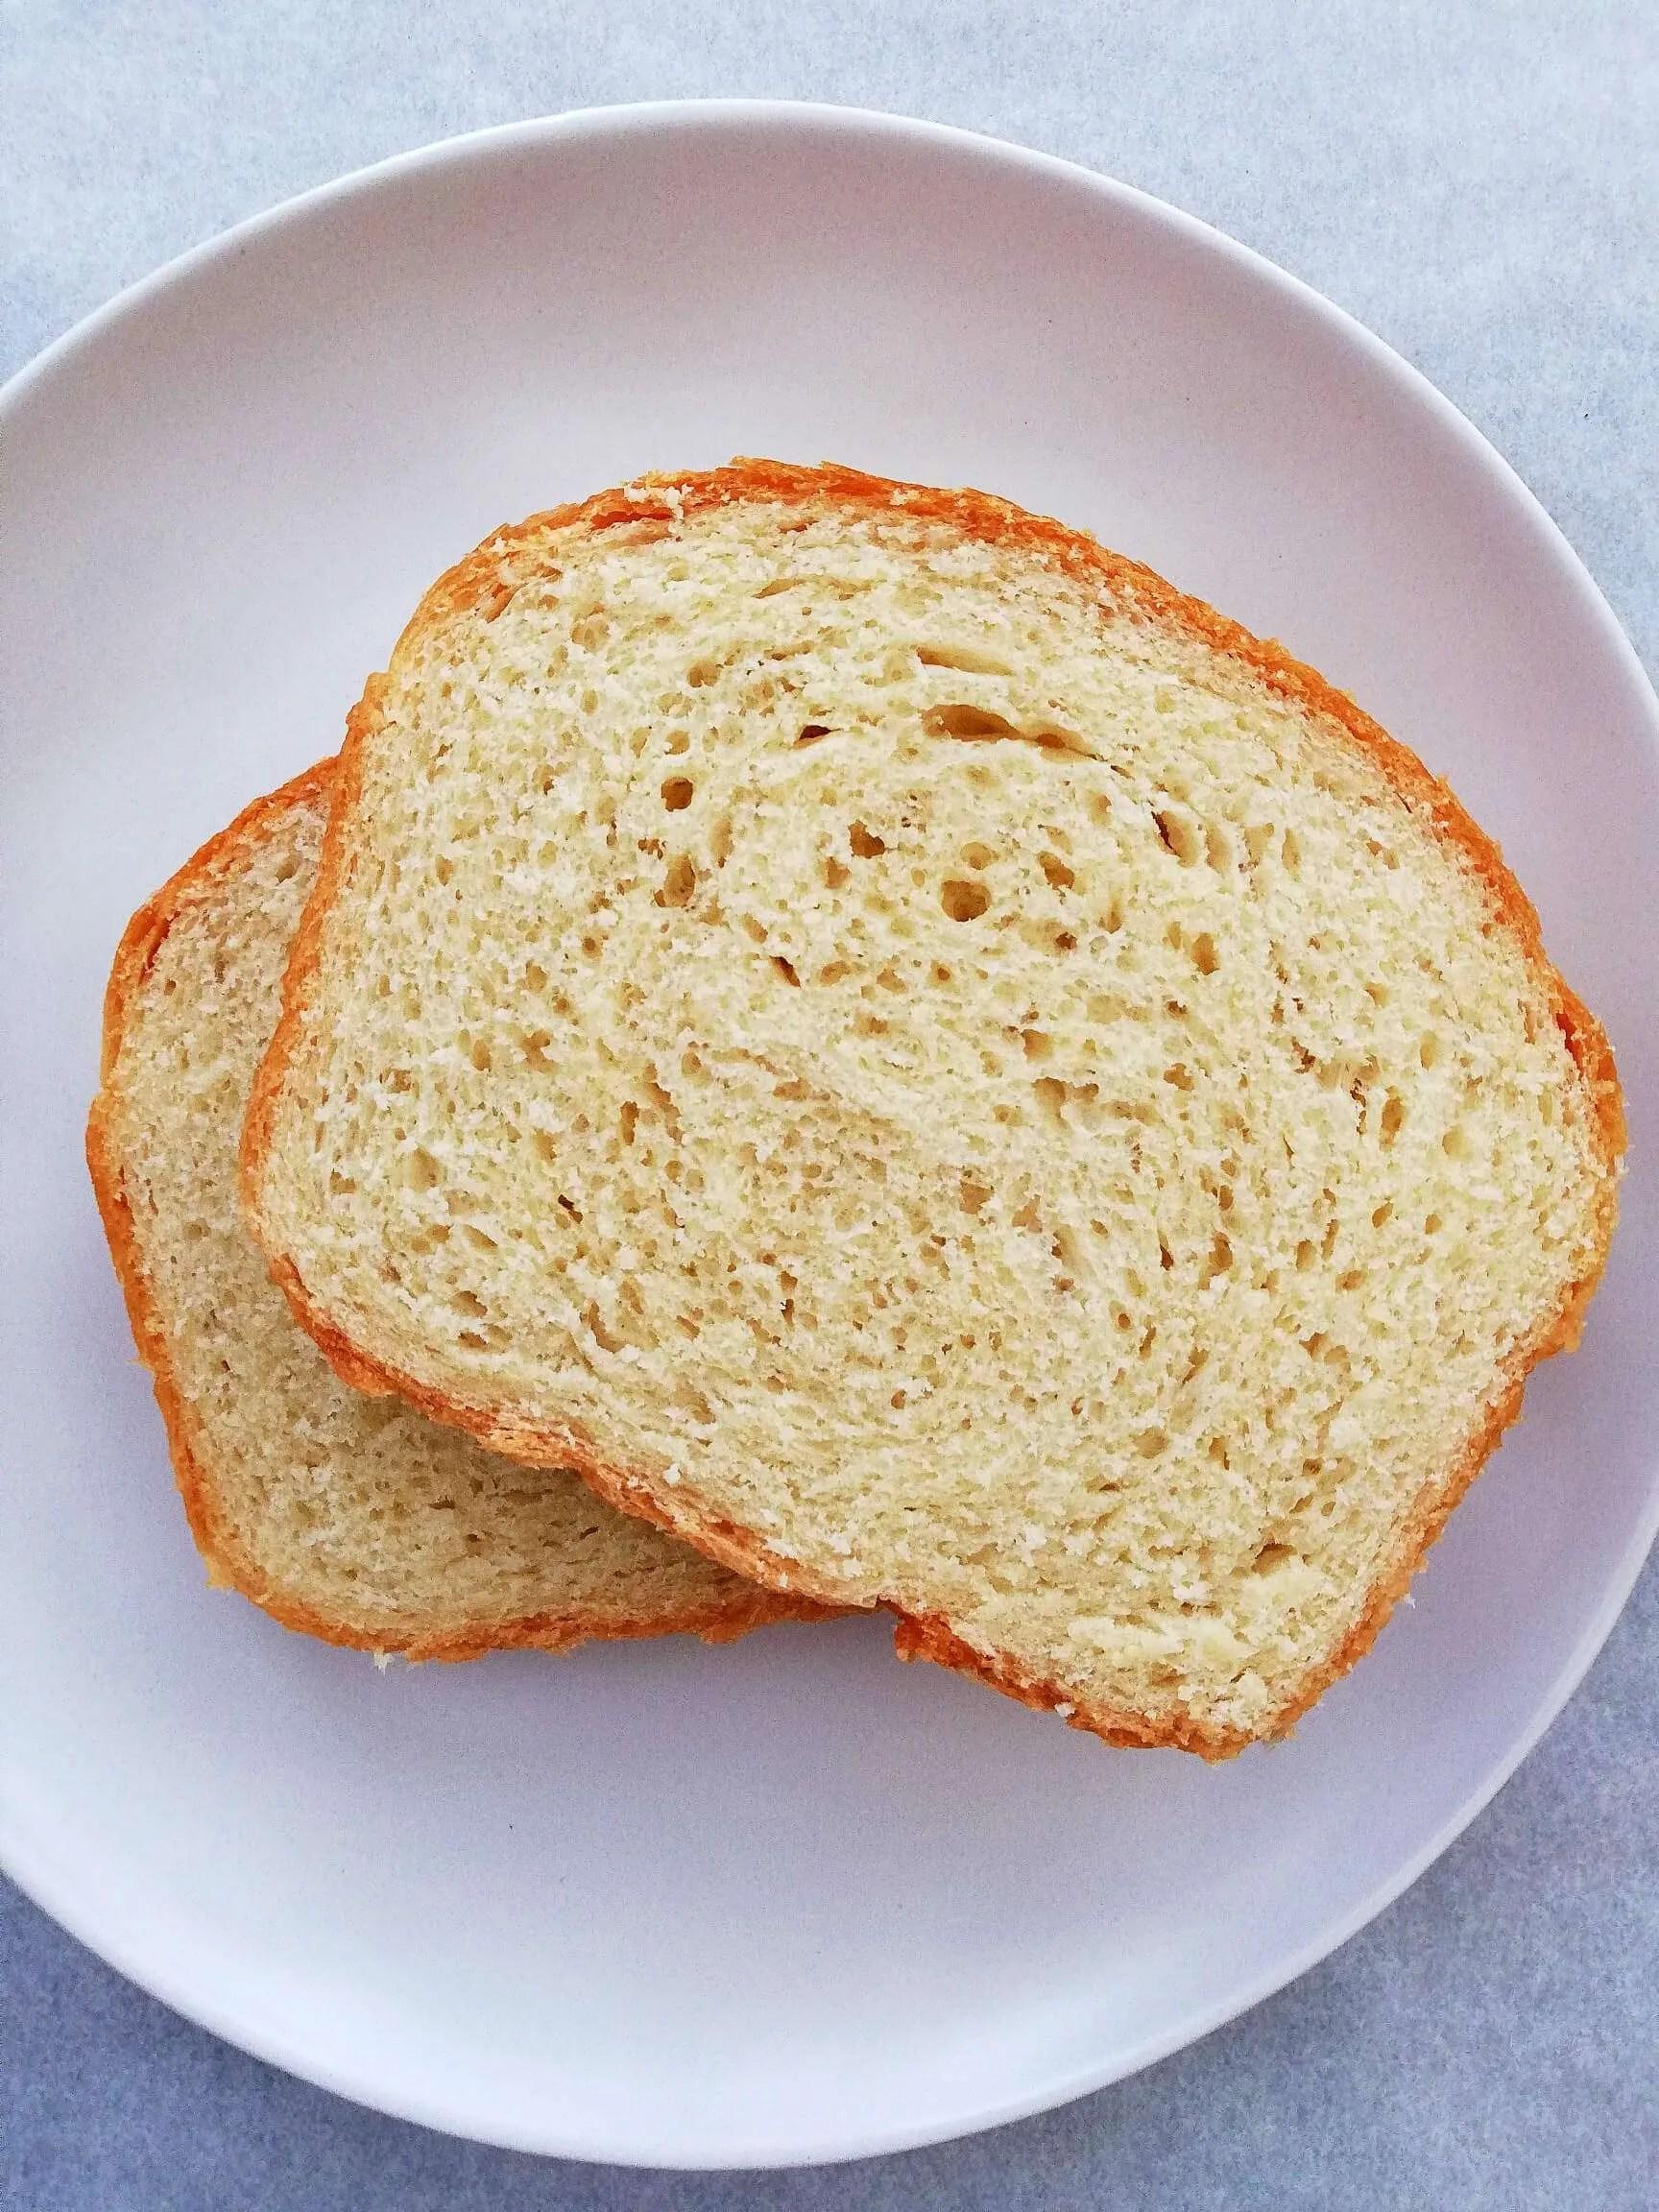 sandwich bread slices in plate